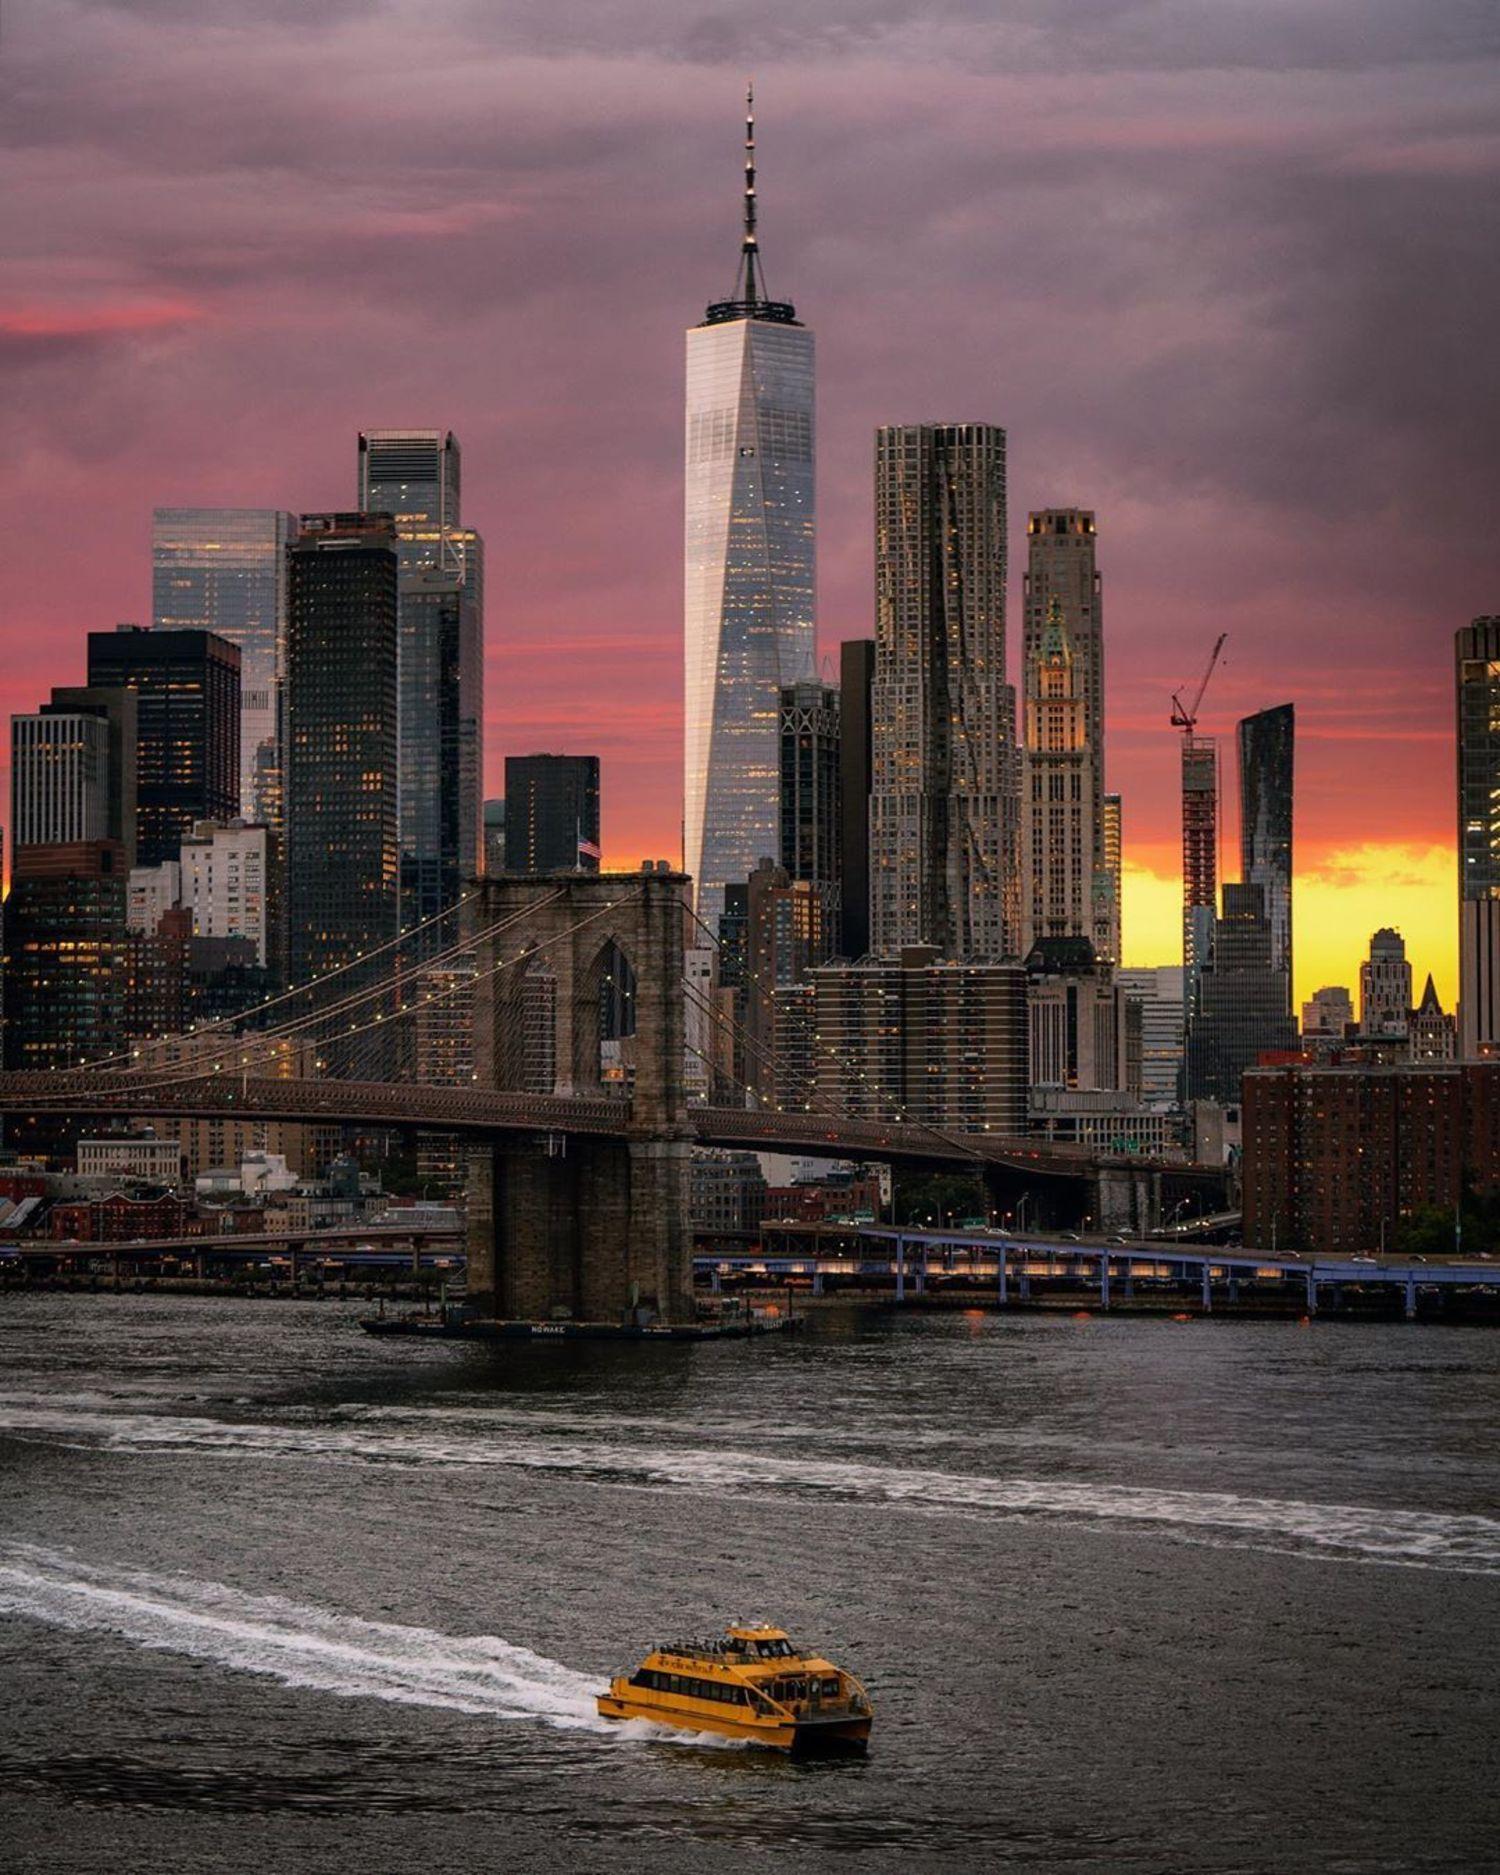 Sunset Over Brooklyn Bridge and Lower Manhattan